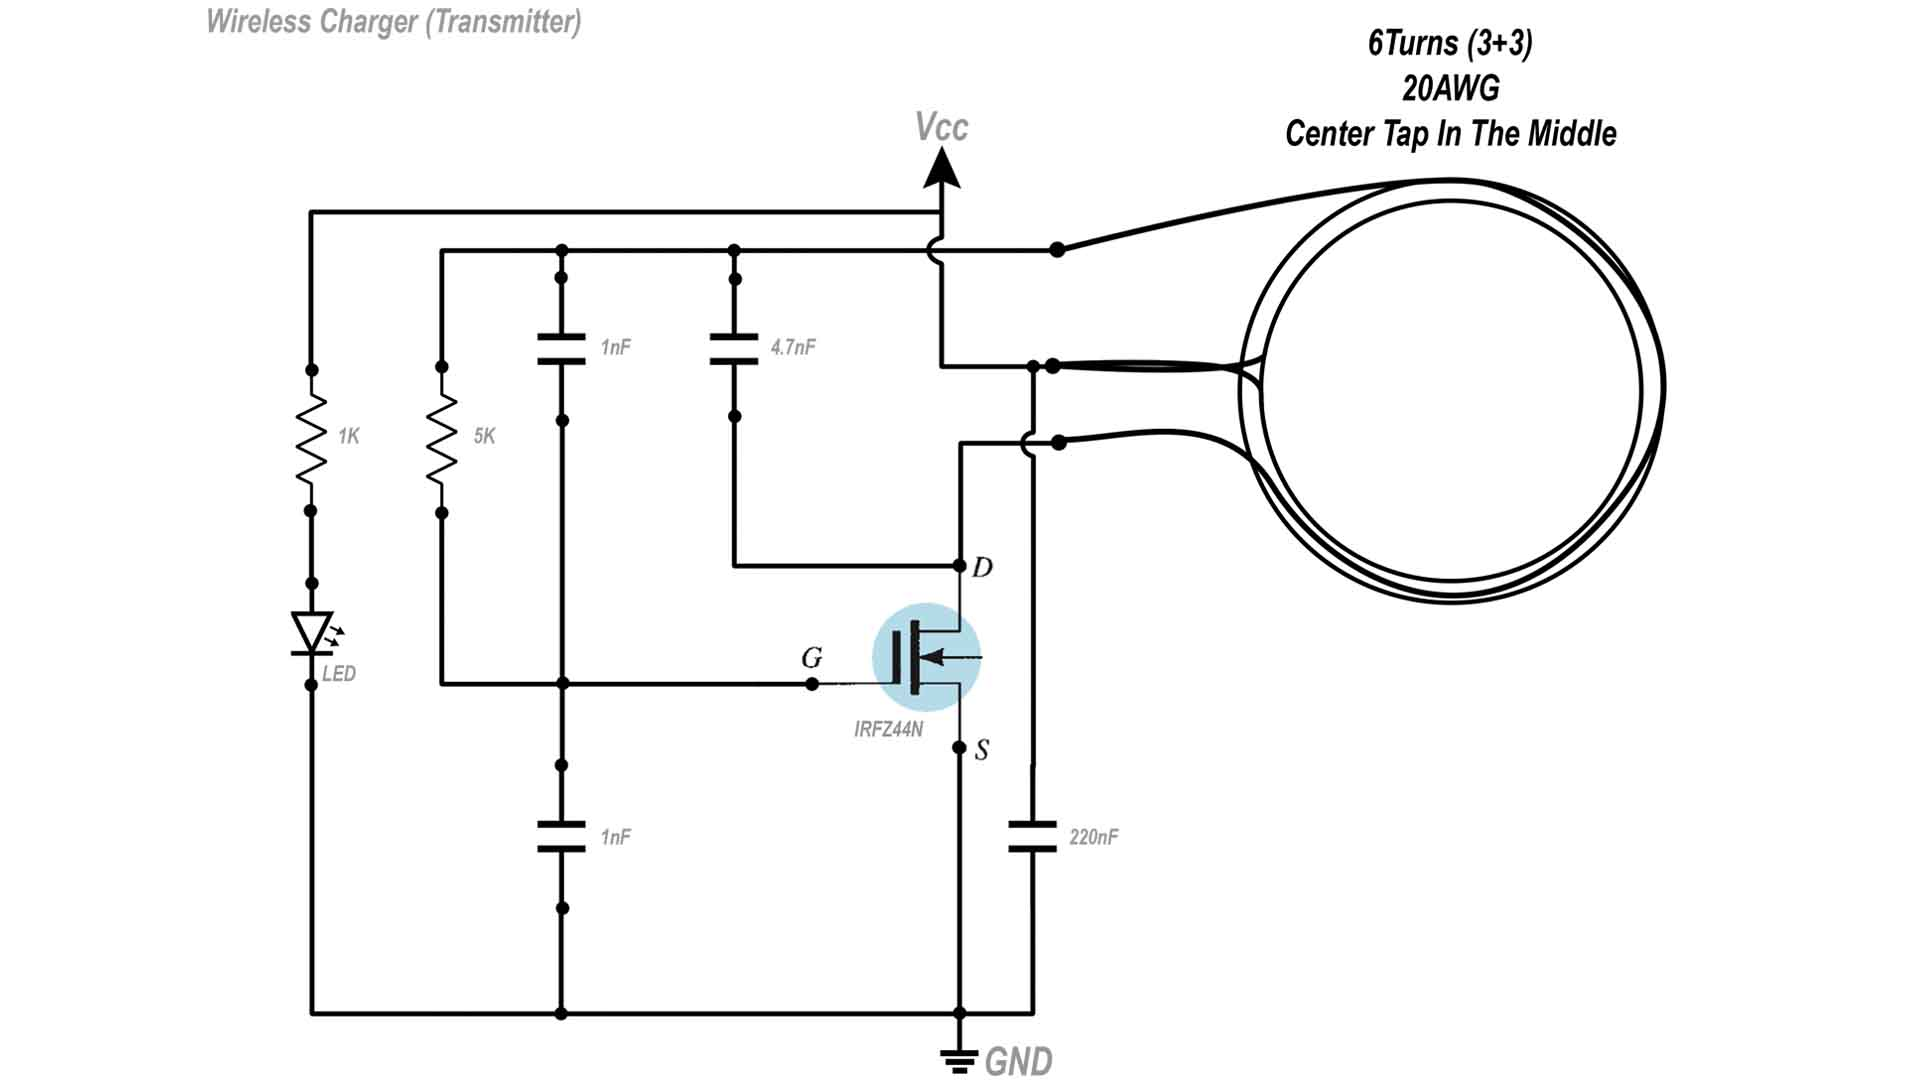 Schematic Transmitter Homemade wireless charger